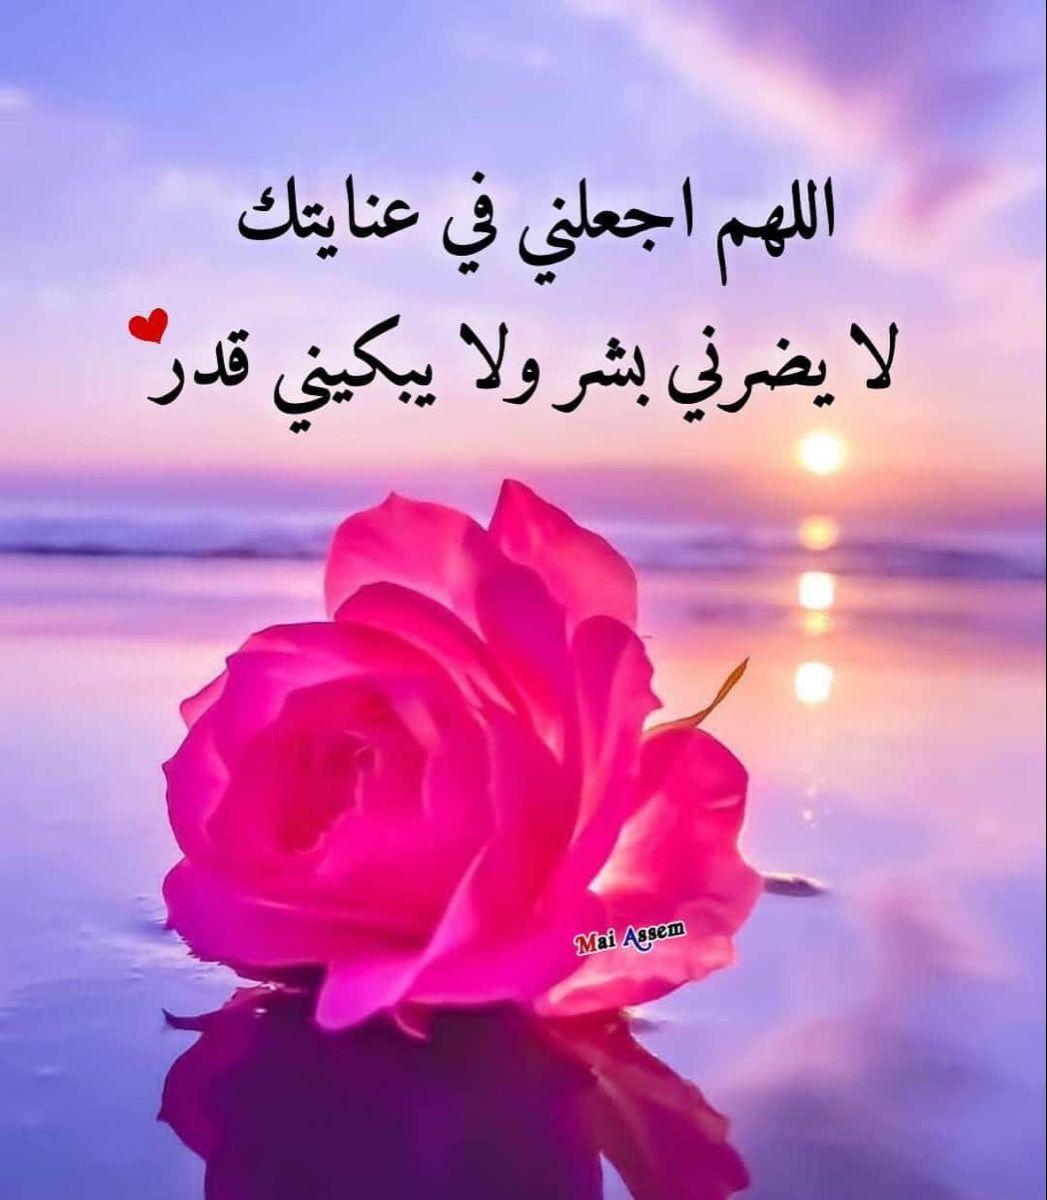 Pin By Joumana On دعاء Duaa Islam Flowers Islam